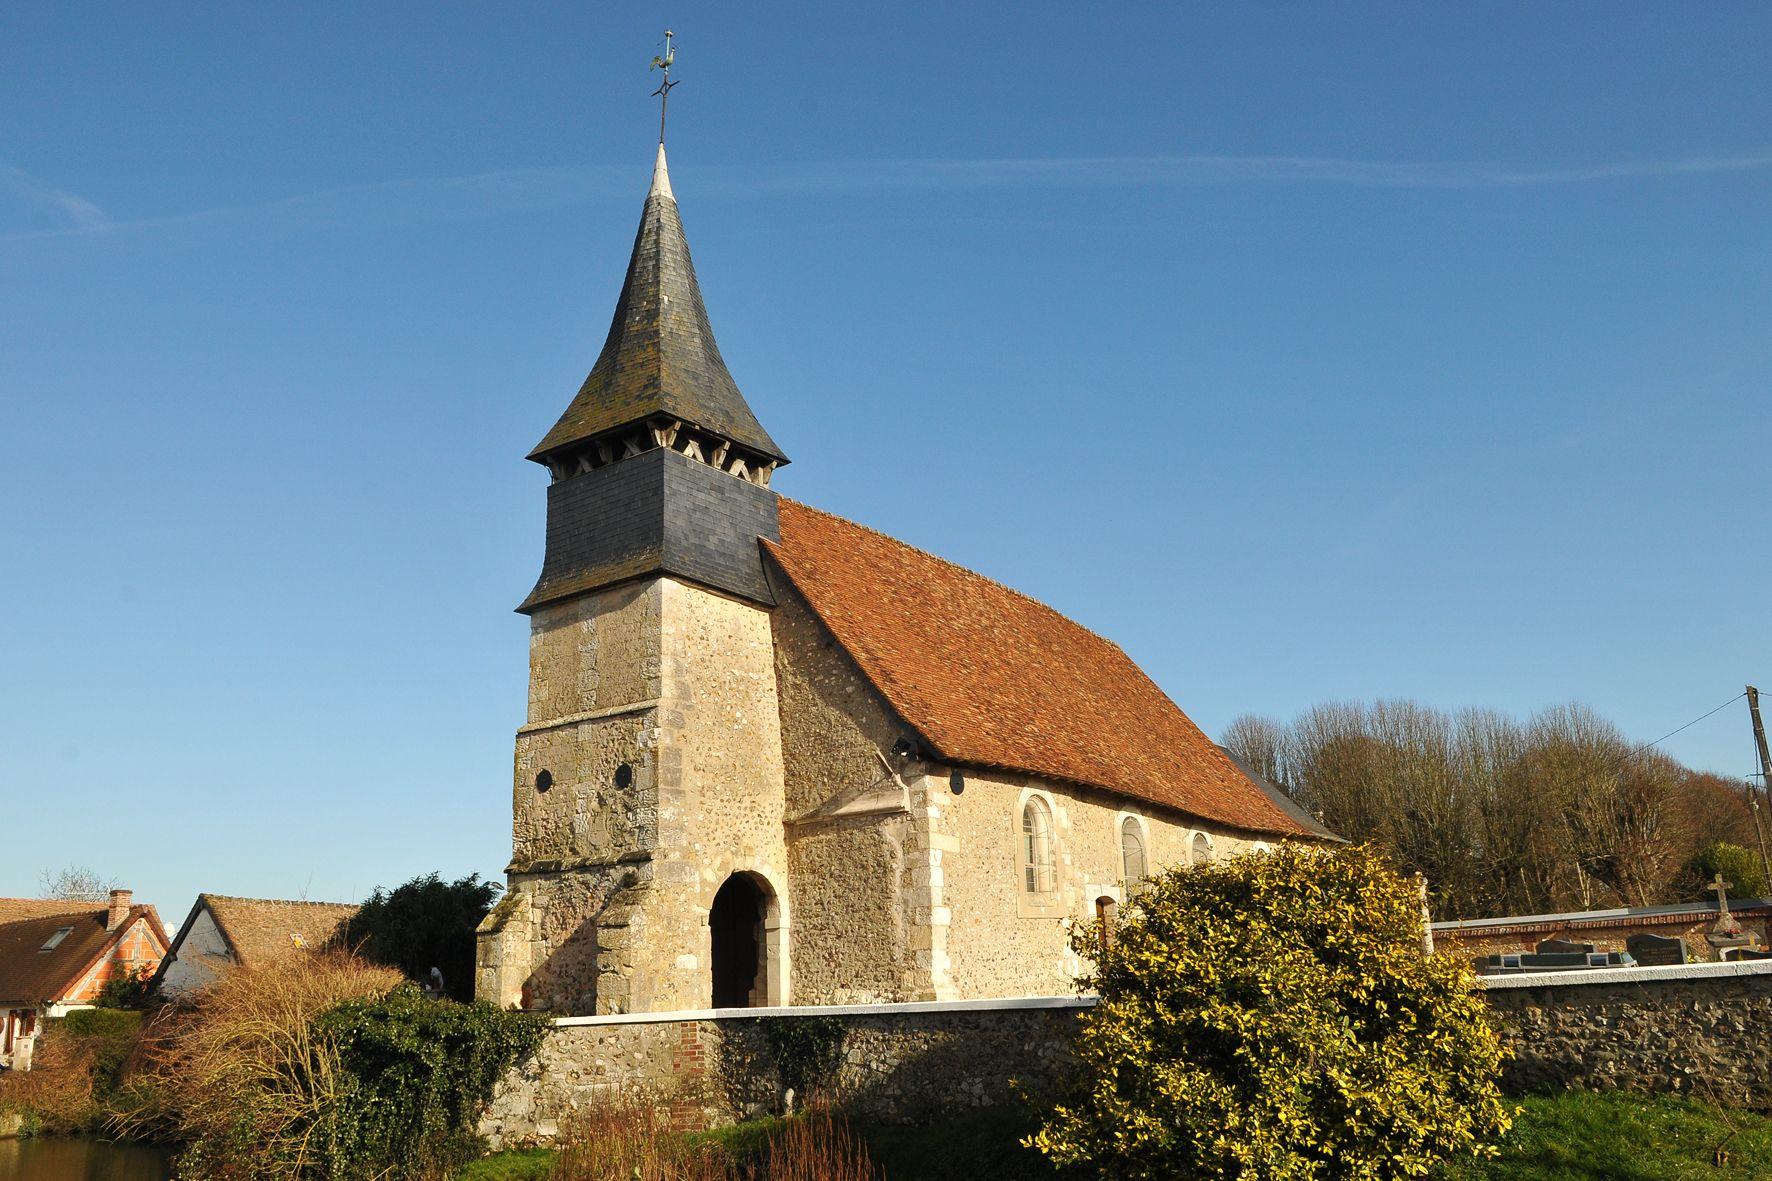 L'église de la Sainte-Trinité de Corny